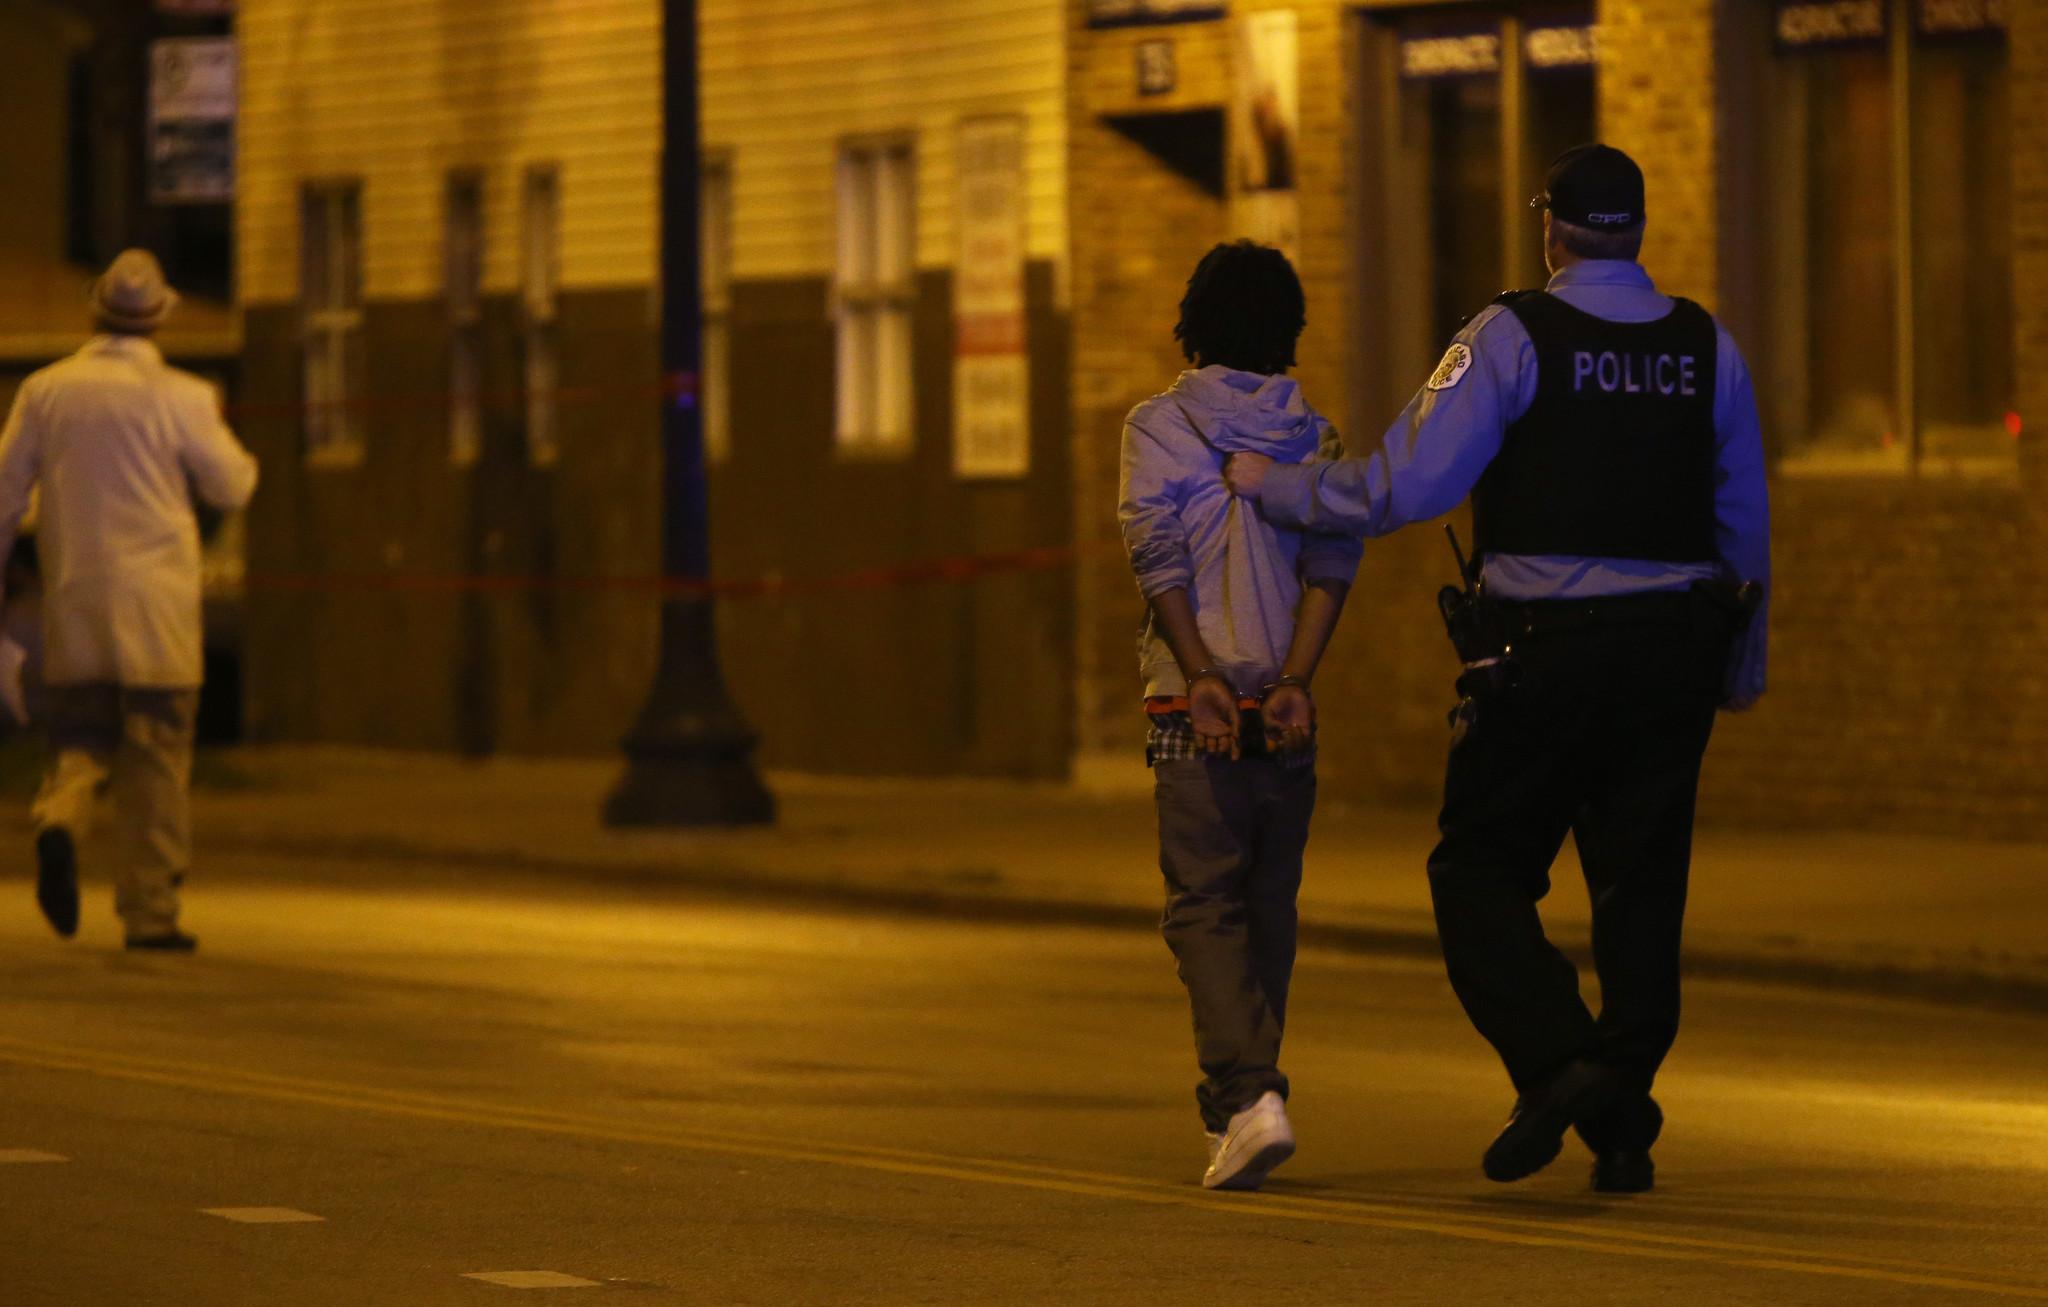 Fatal shooting, possible involvement